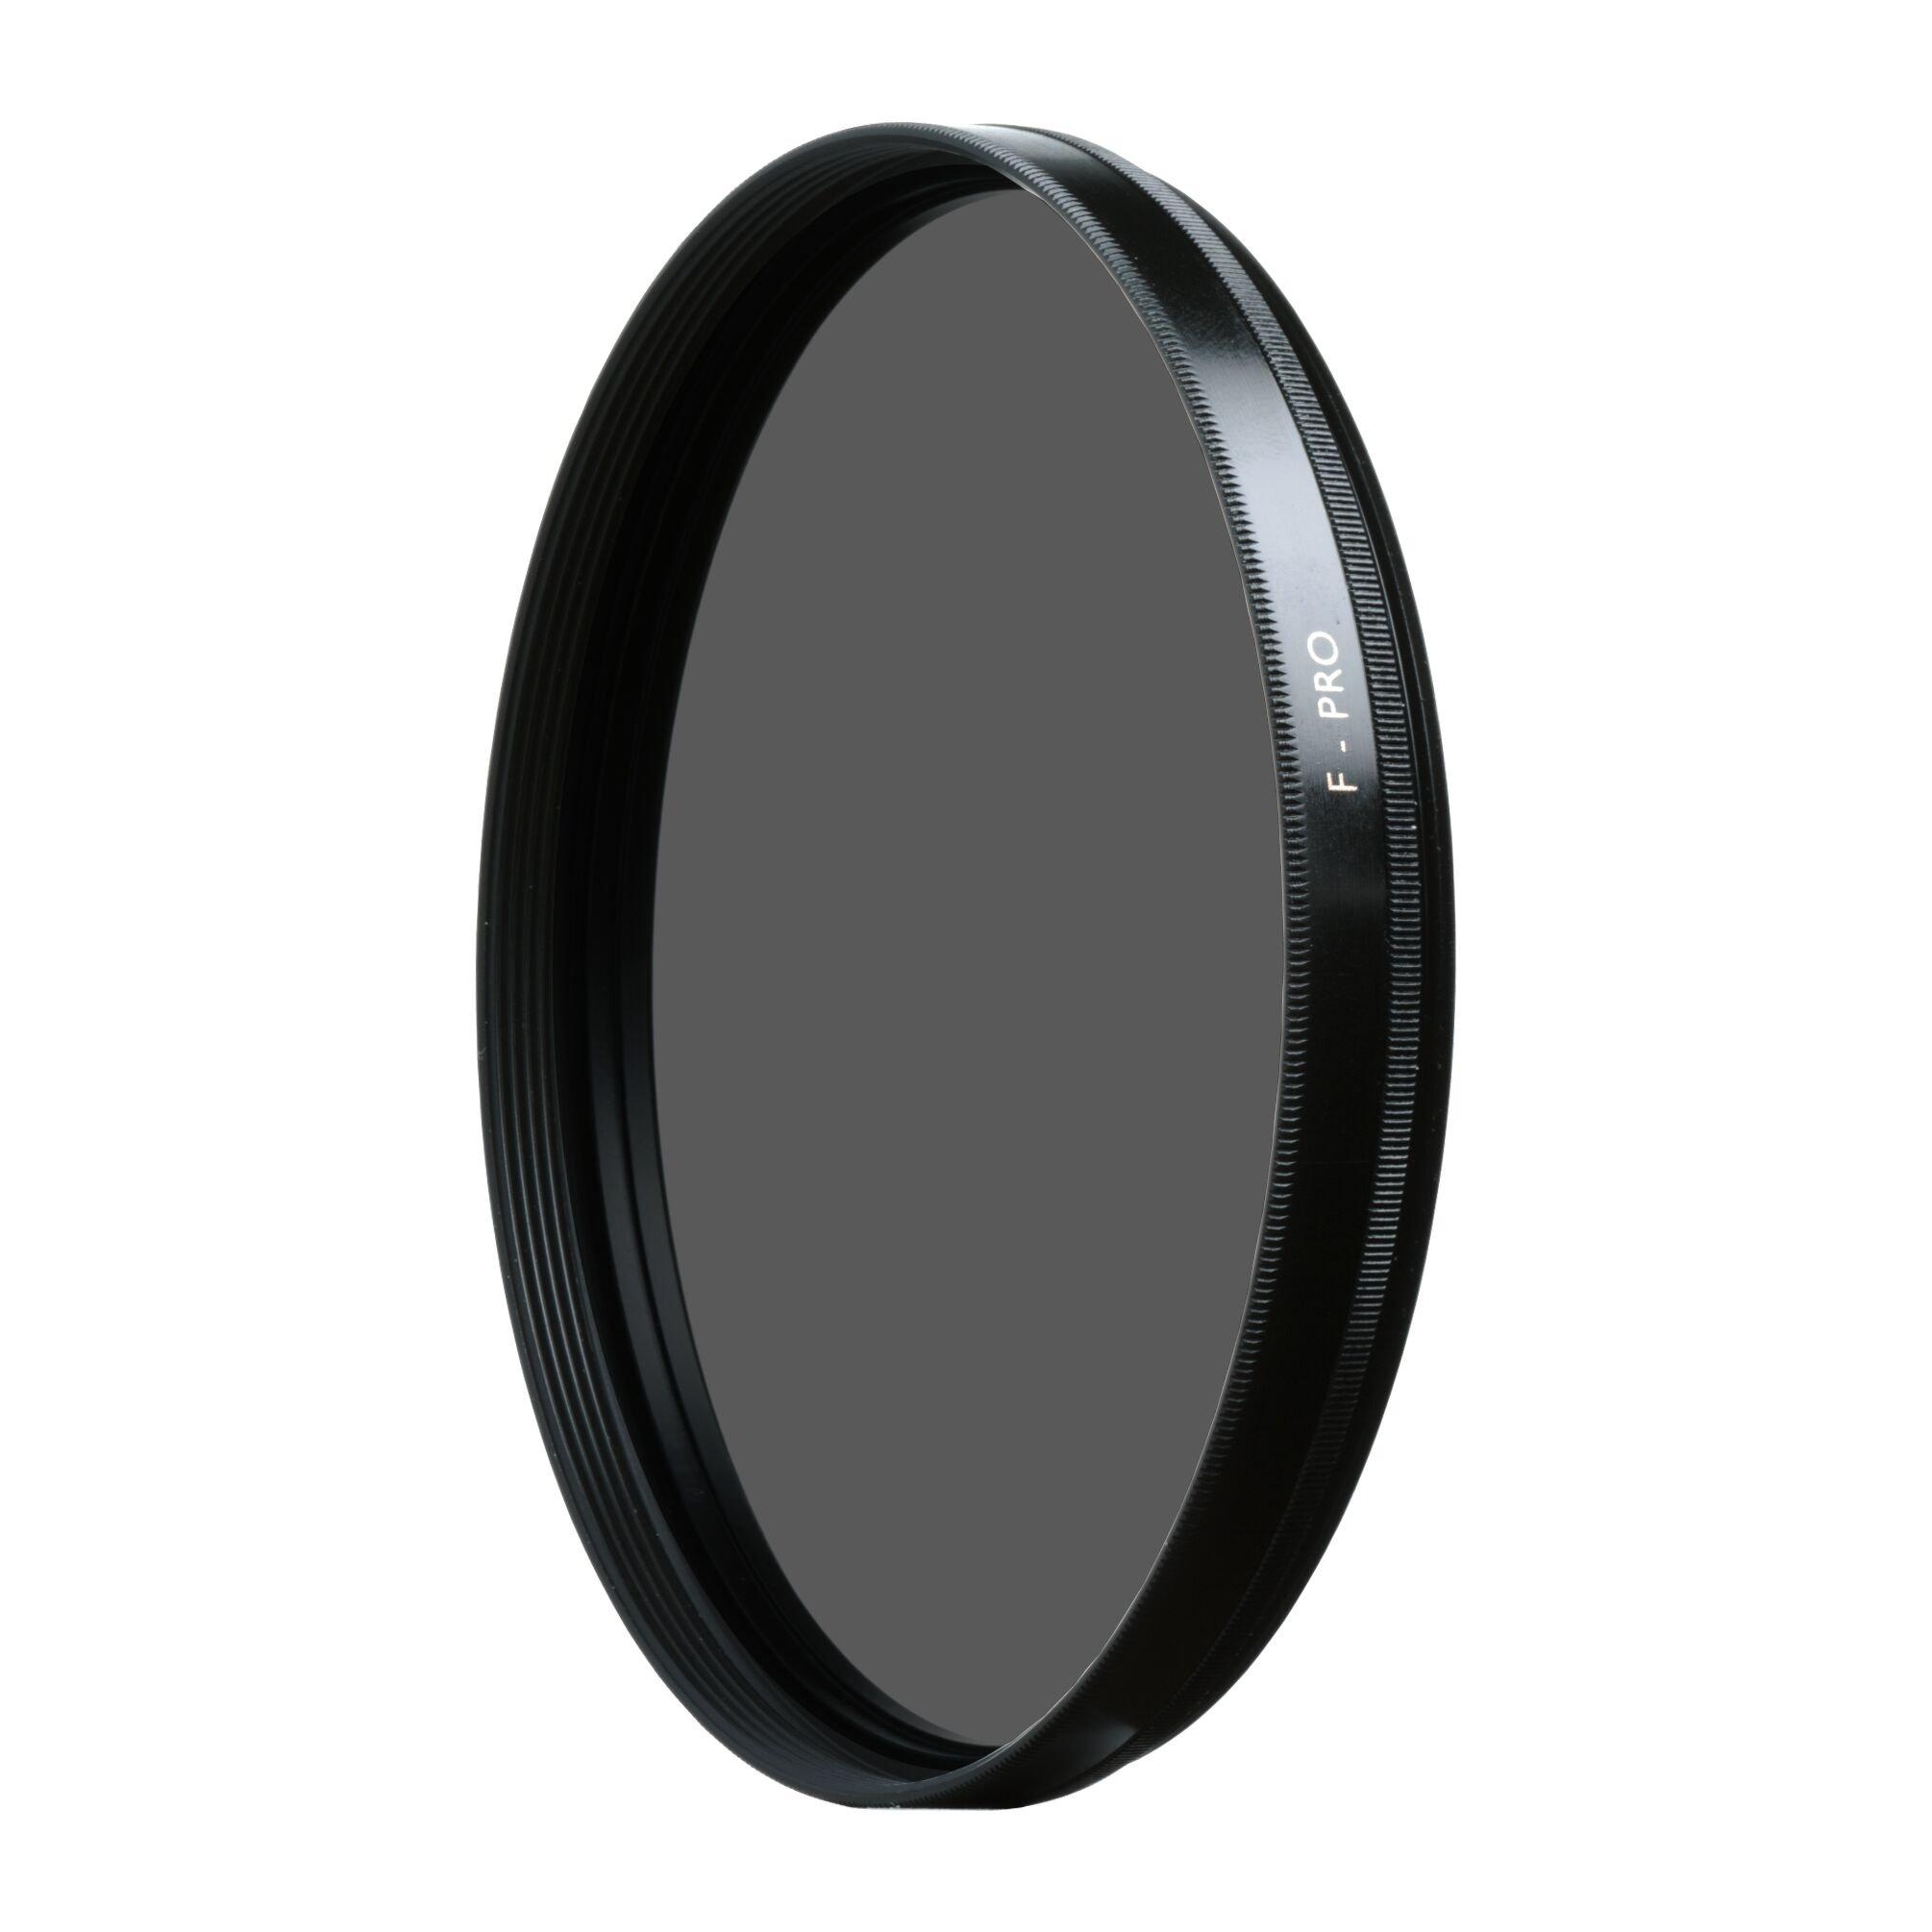 B+W 46mm Kaesemann Circular Polarizer with Multi-Resistant Coating